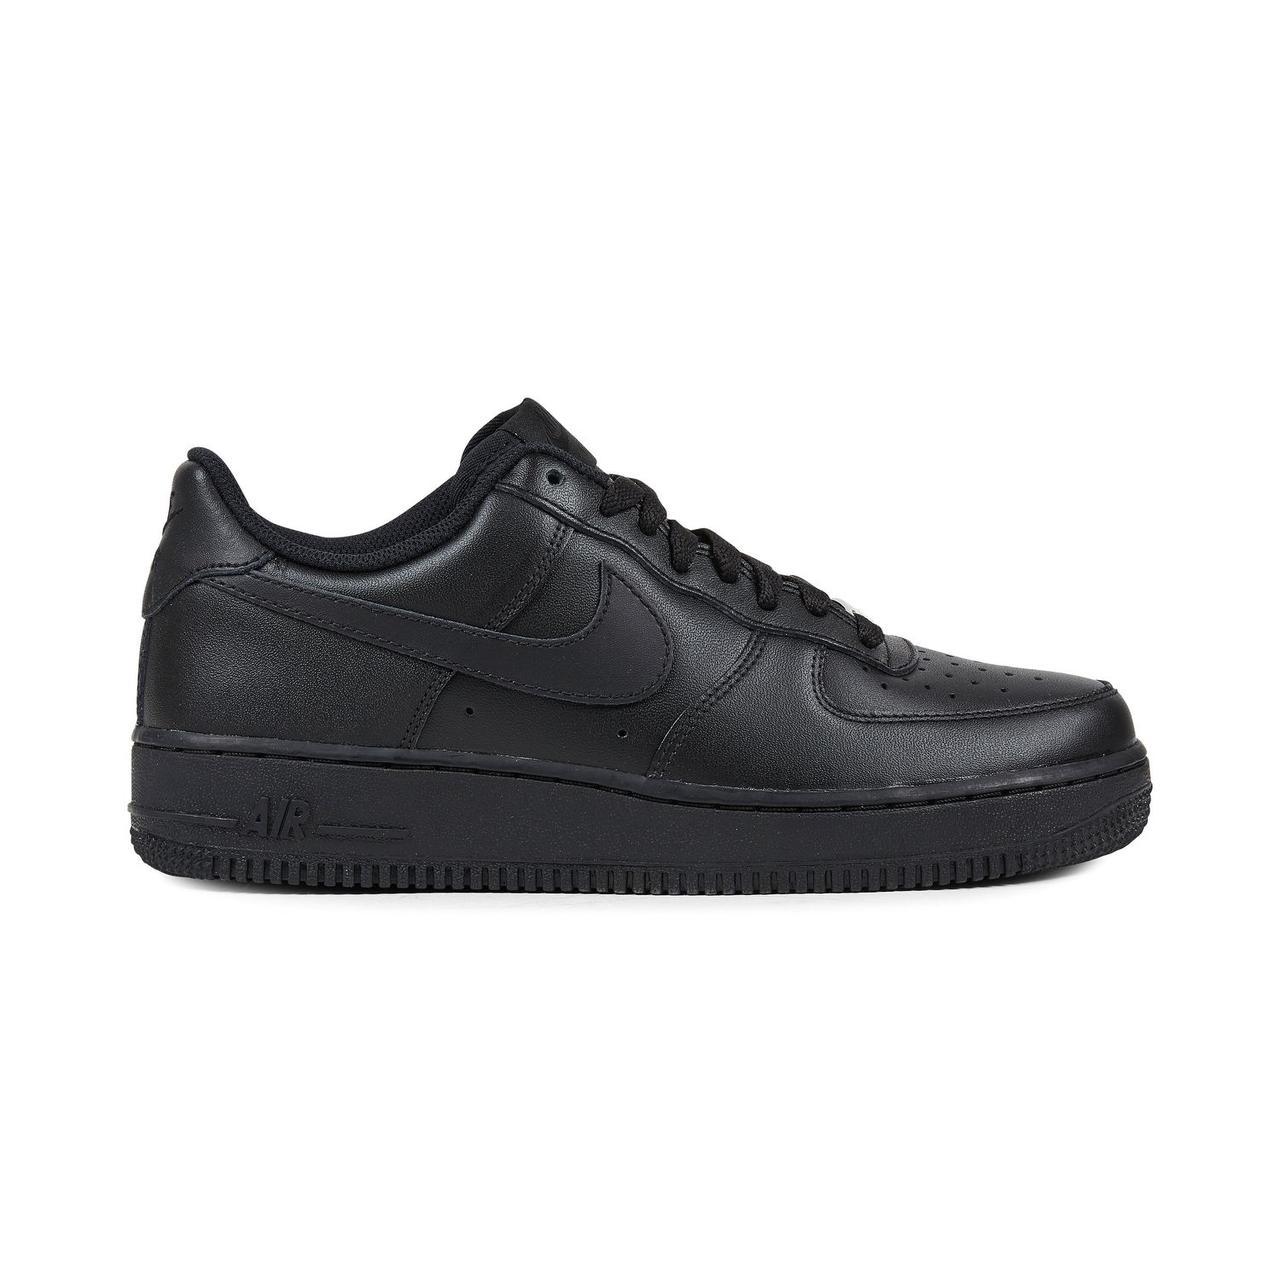 Кроссовки Nike Air Force 1 Low 07 315122-001 оригинал  продажа 629c56234c33d